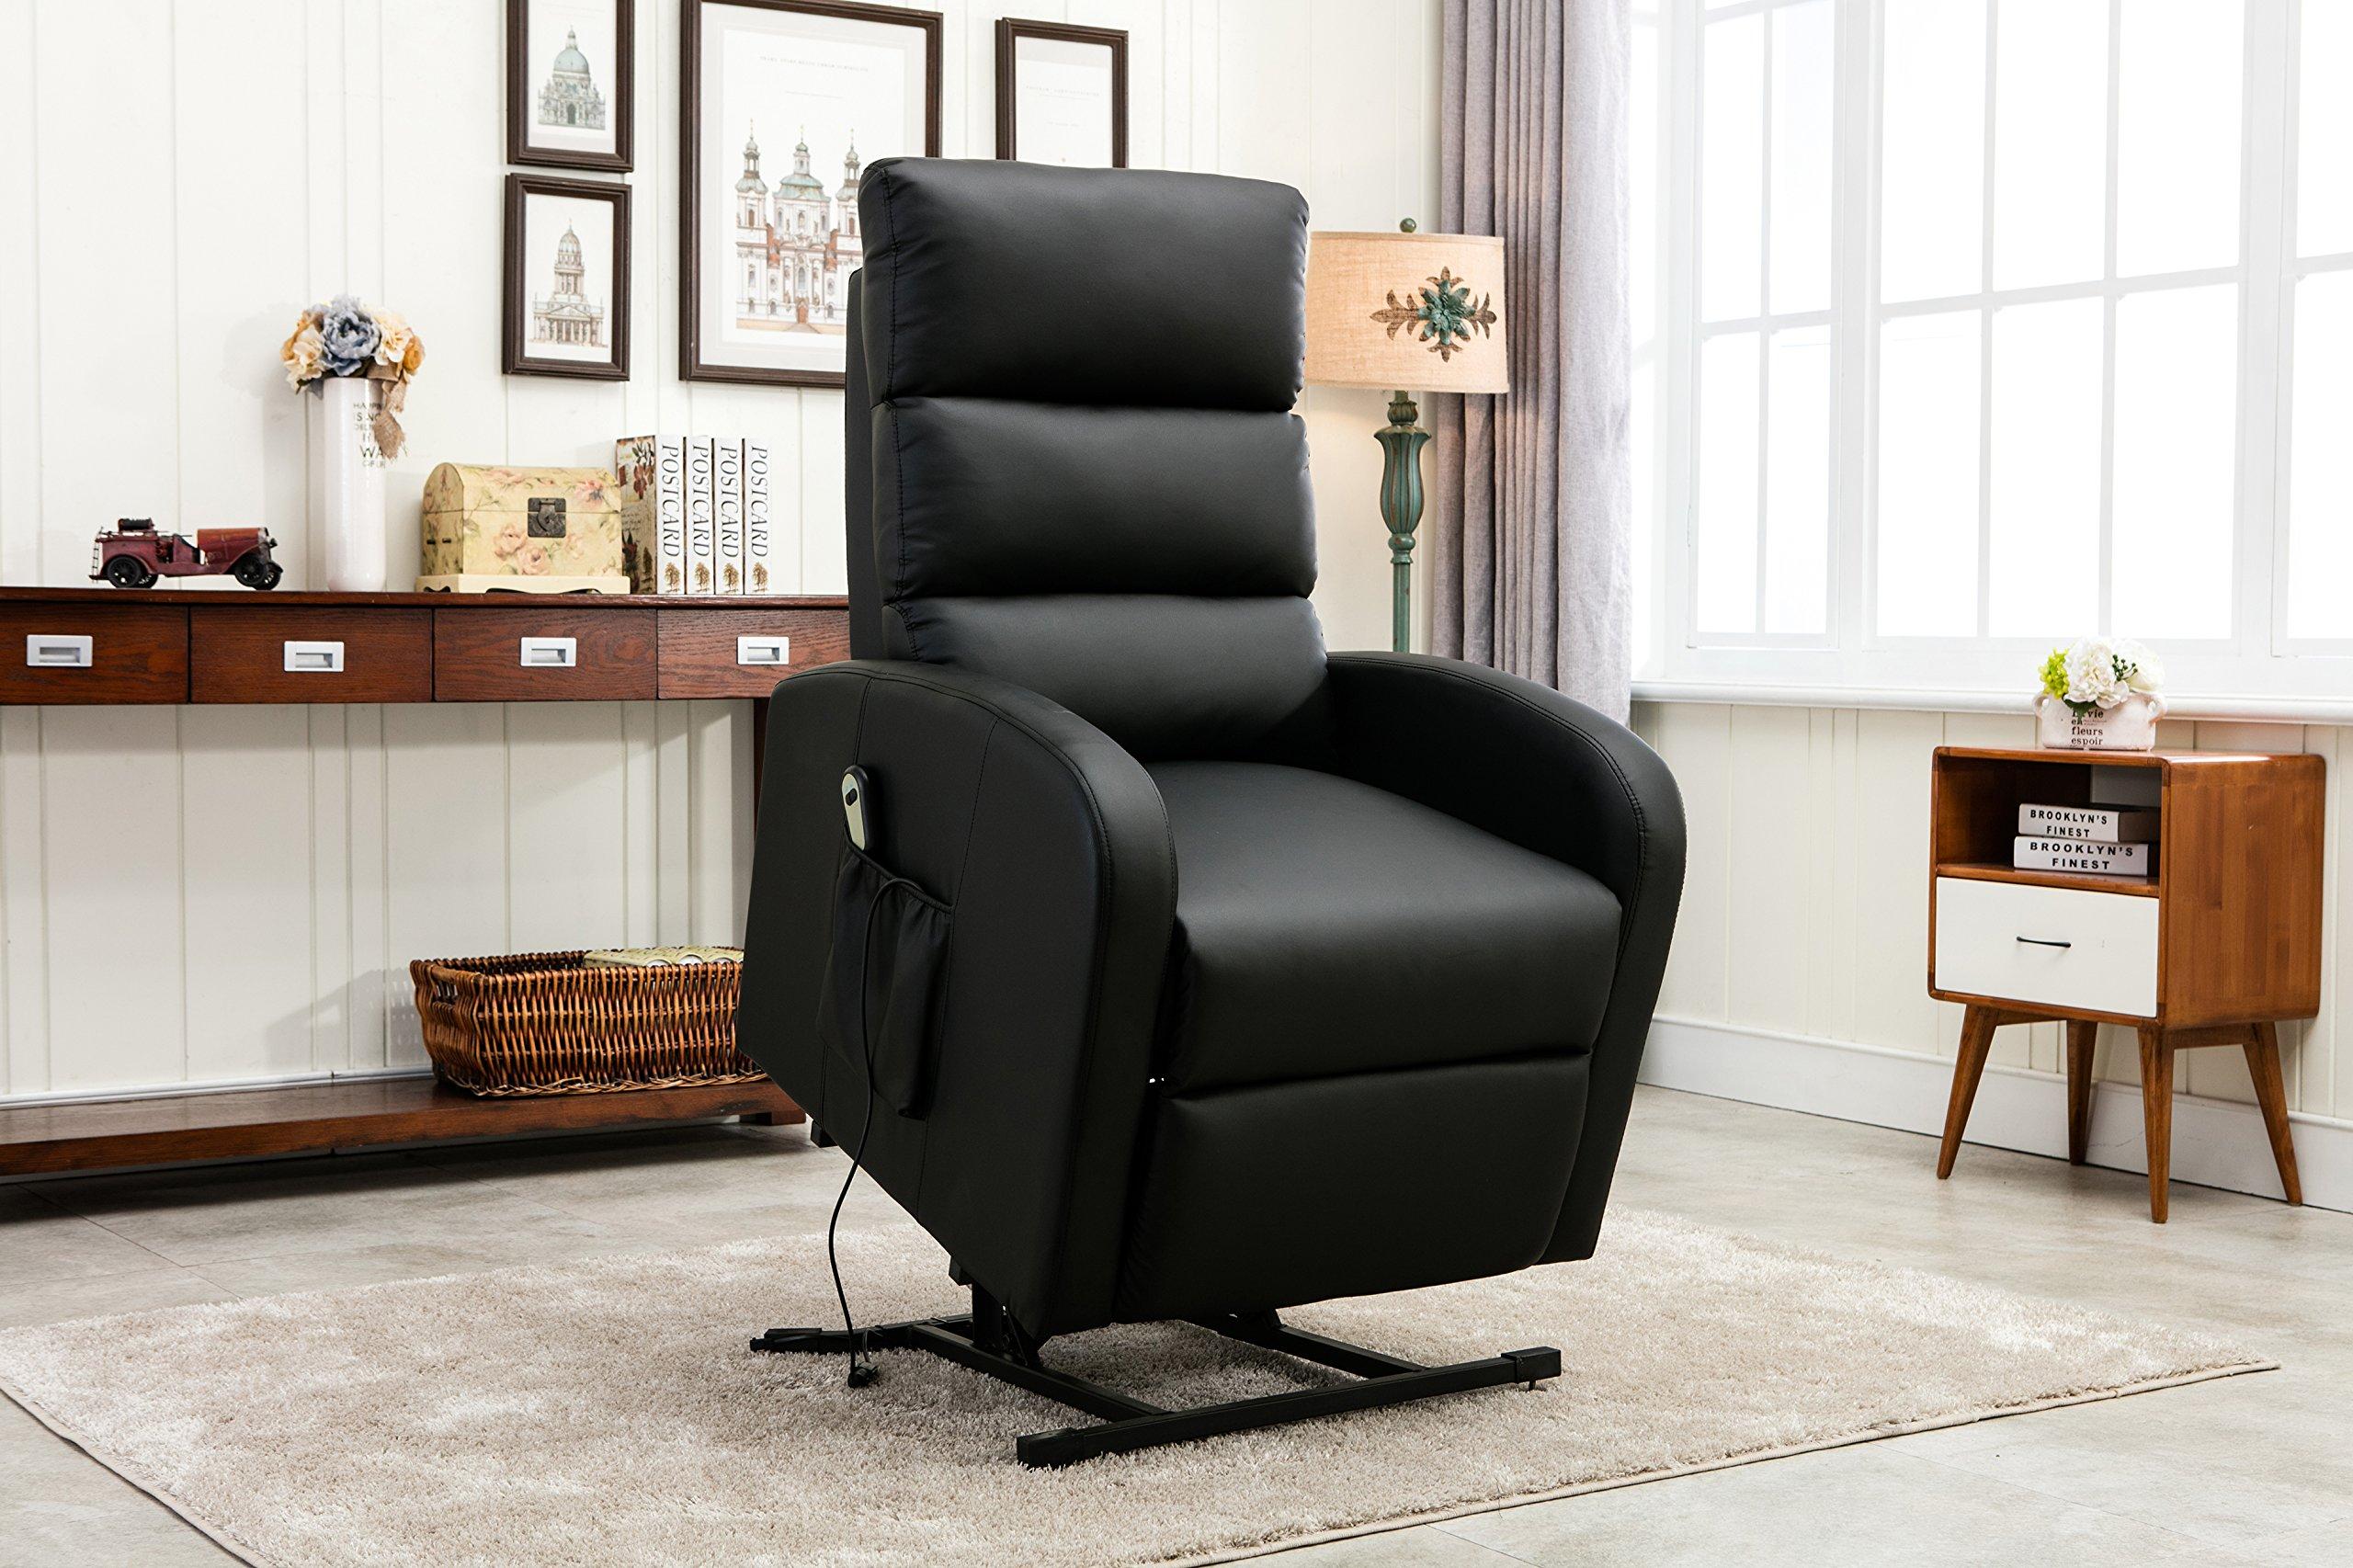 Divano Roma Furniture Classic Plush Bonded Leather Power Lift Recliner Living Room Chair (Black)